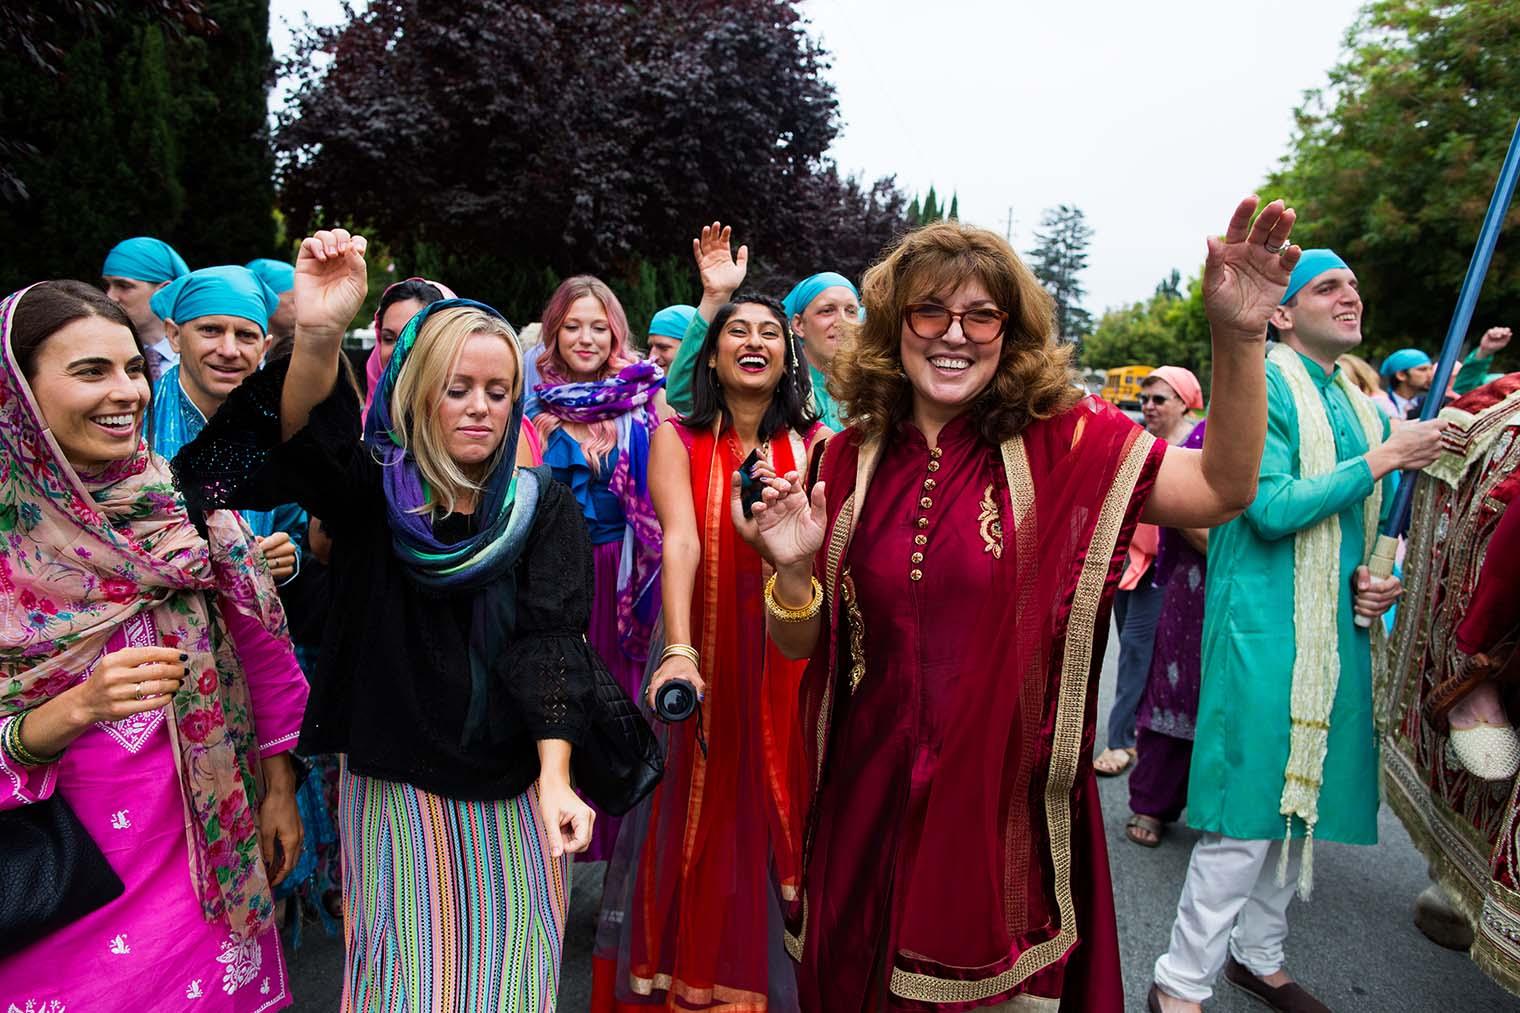 Gurdwara Sahib of Fremont Wedding Photographer